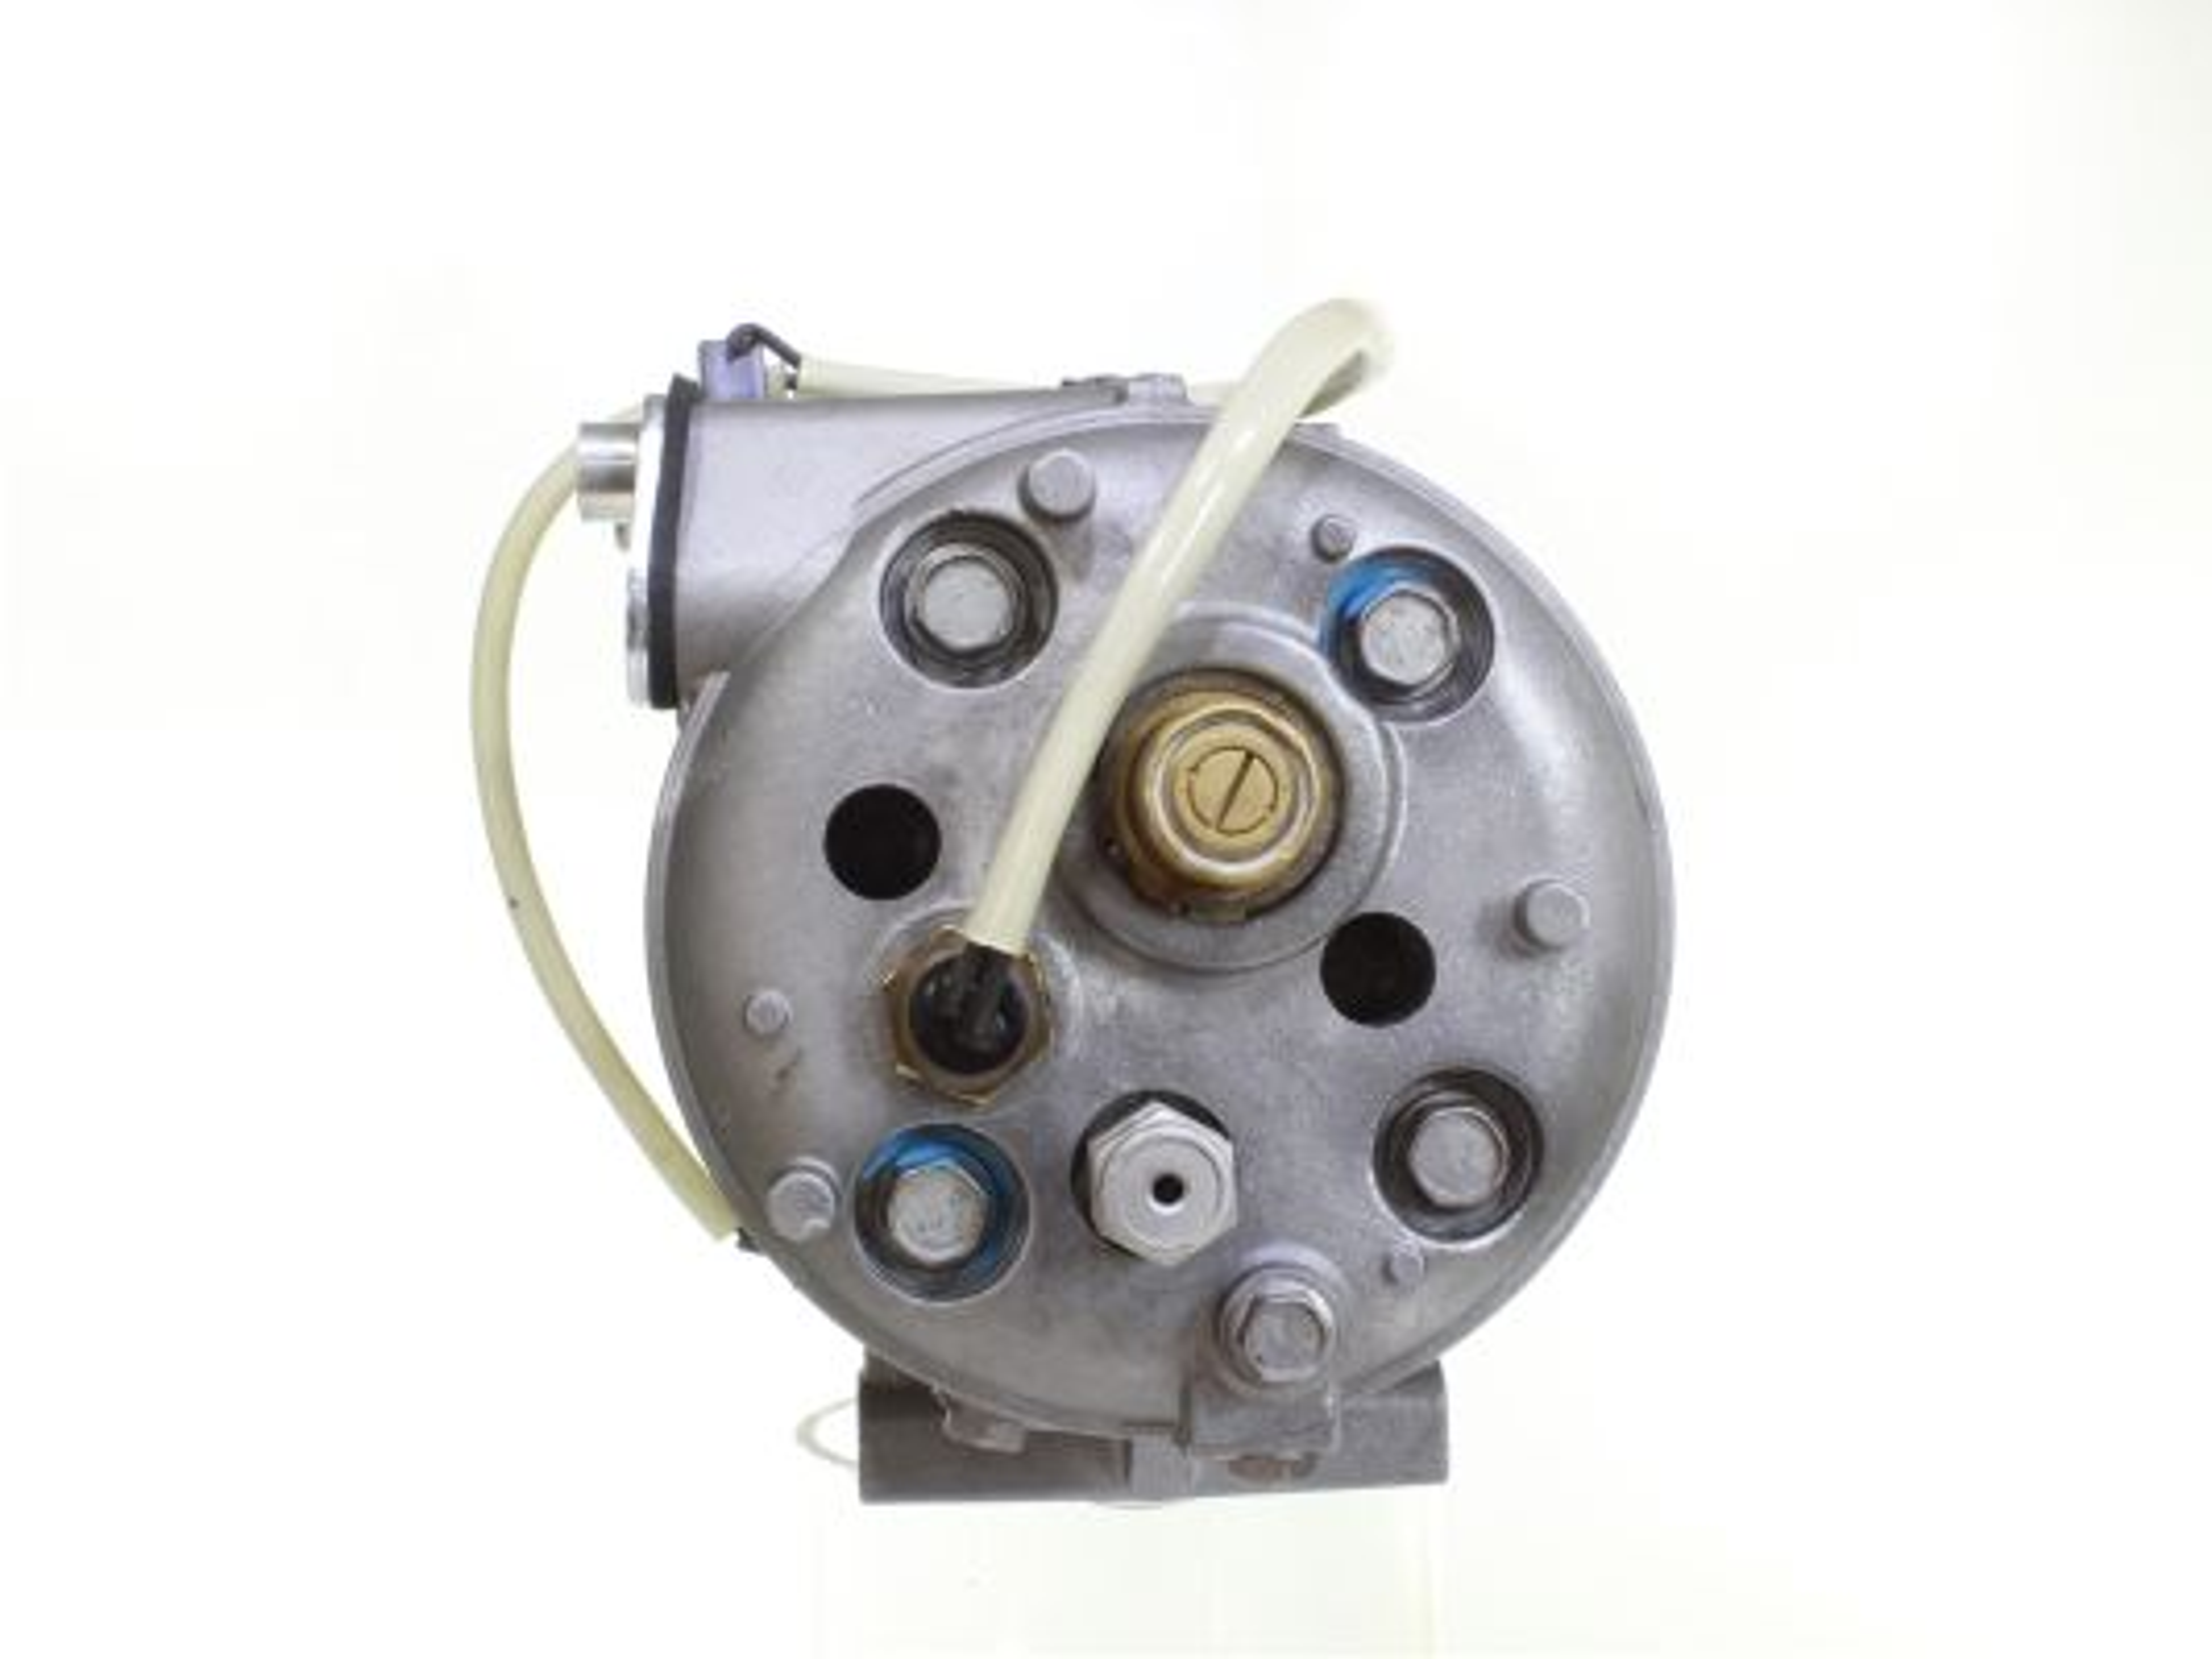 10550361 Kompressor, Klimaanlage ALANKO 550361 - Große Auswahl - stark reduziert